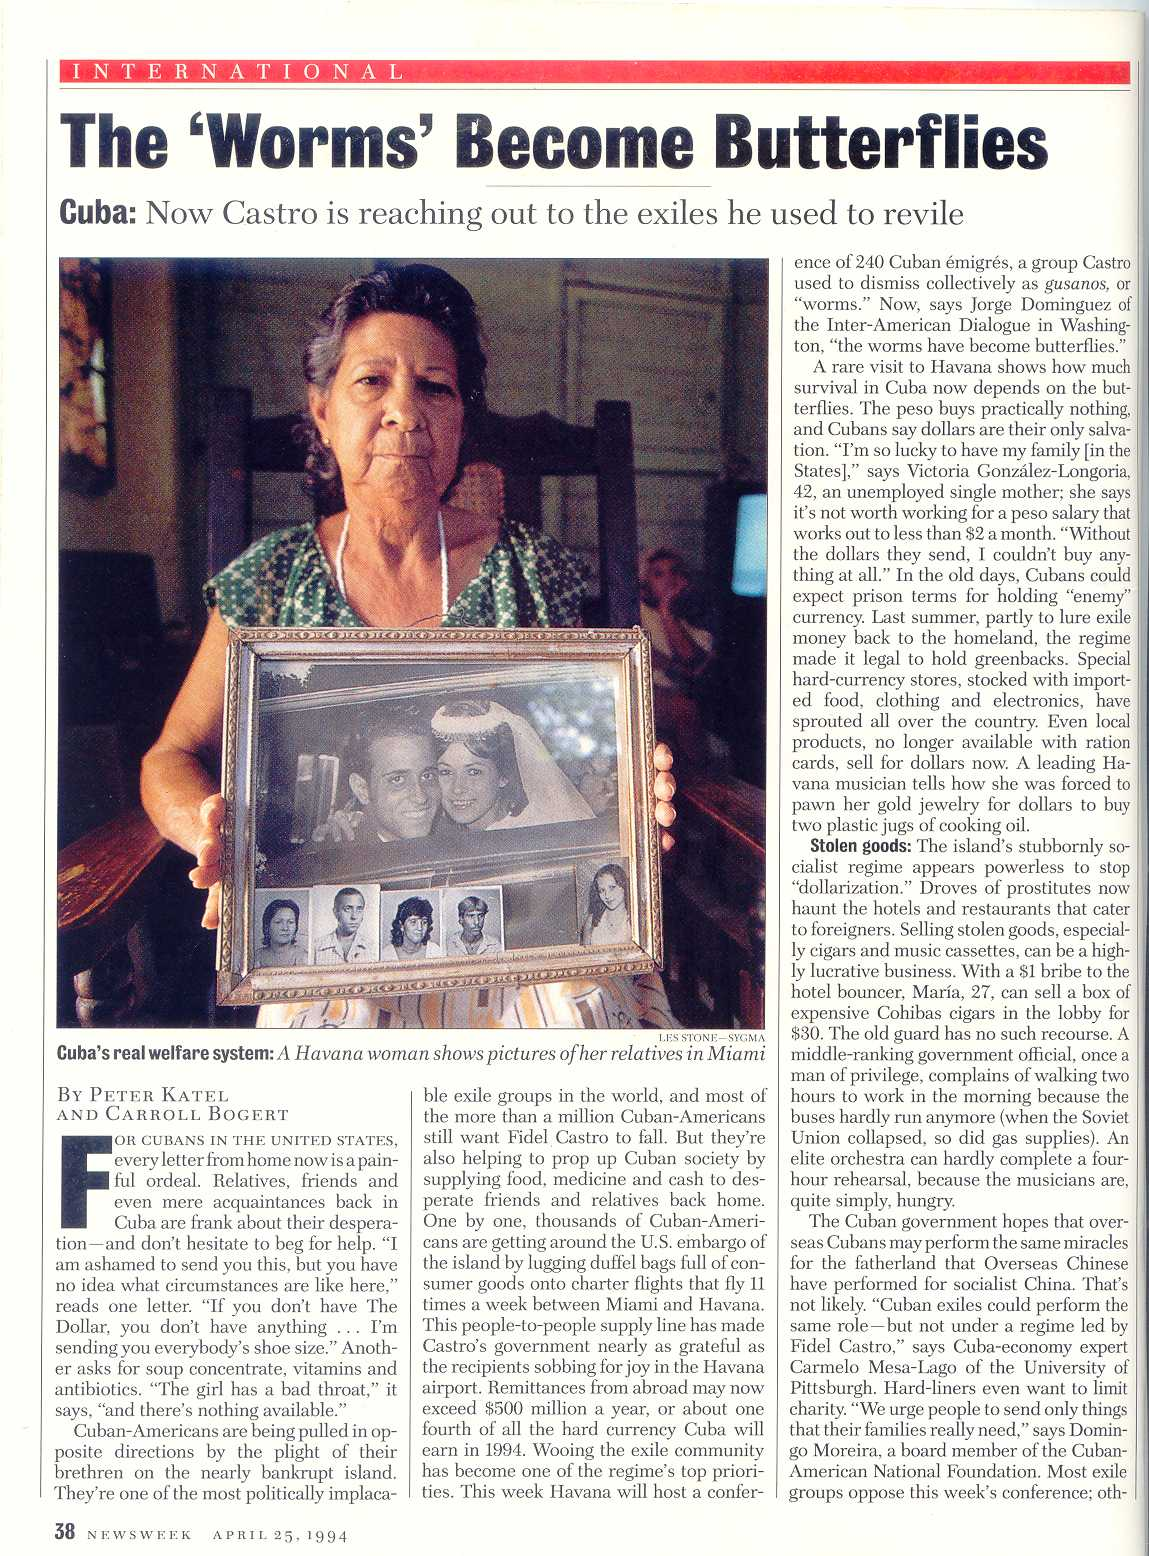 Peter Katel in Little Havana – NEWSWEEK Magazine (1994)